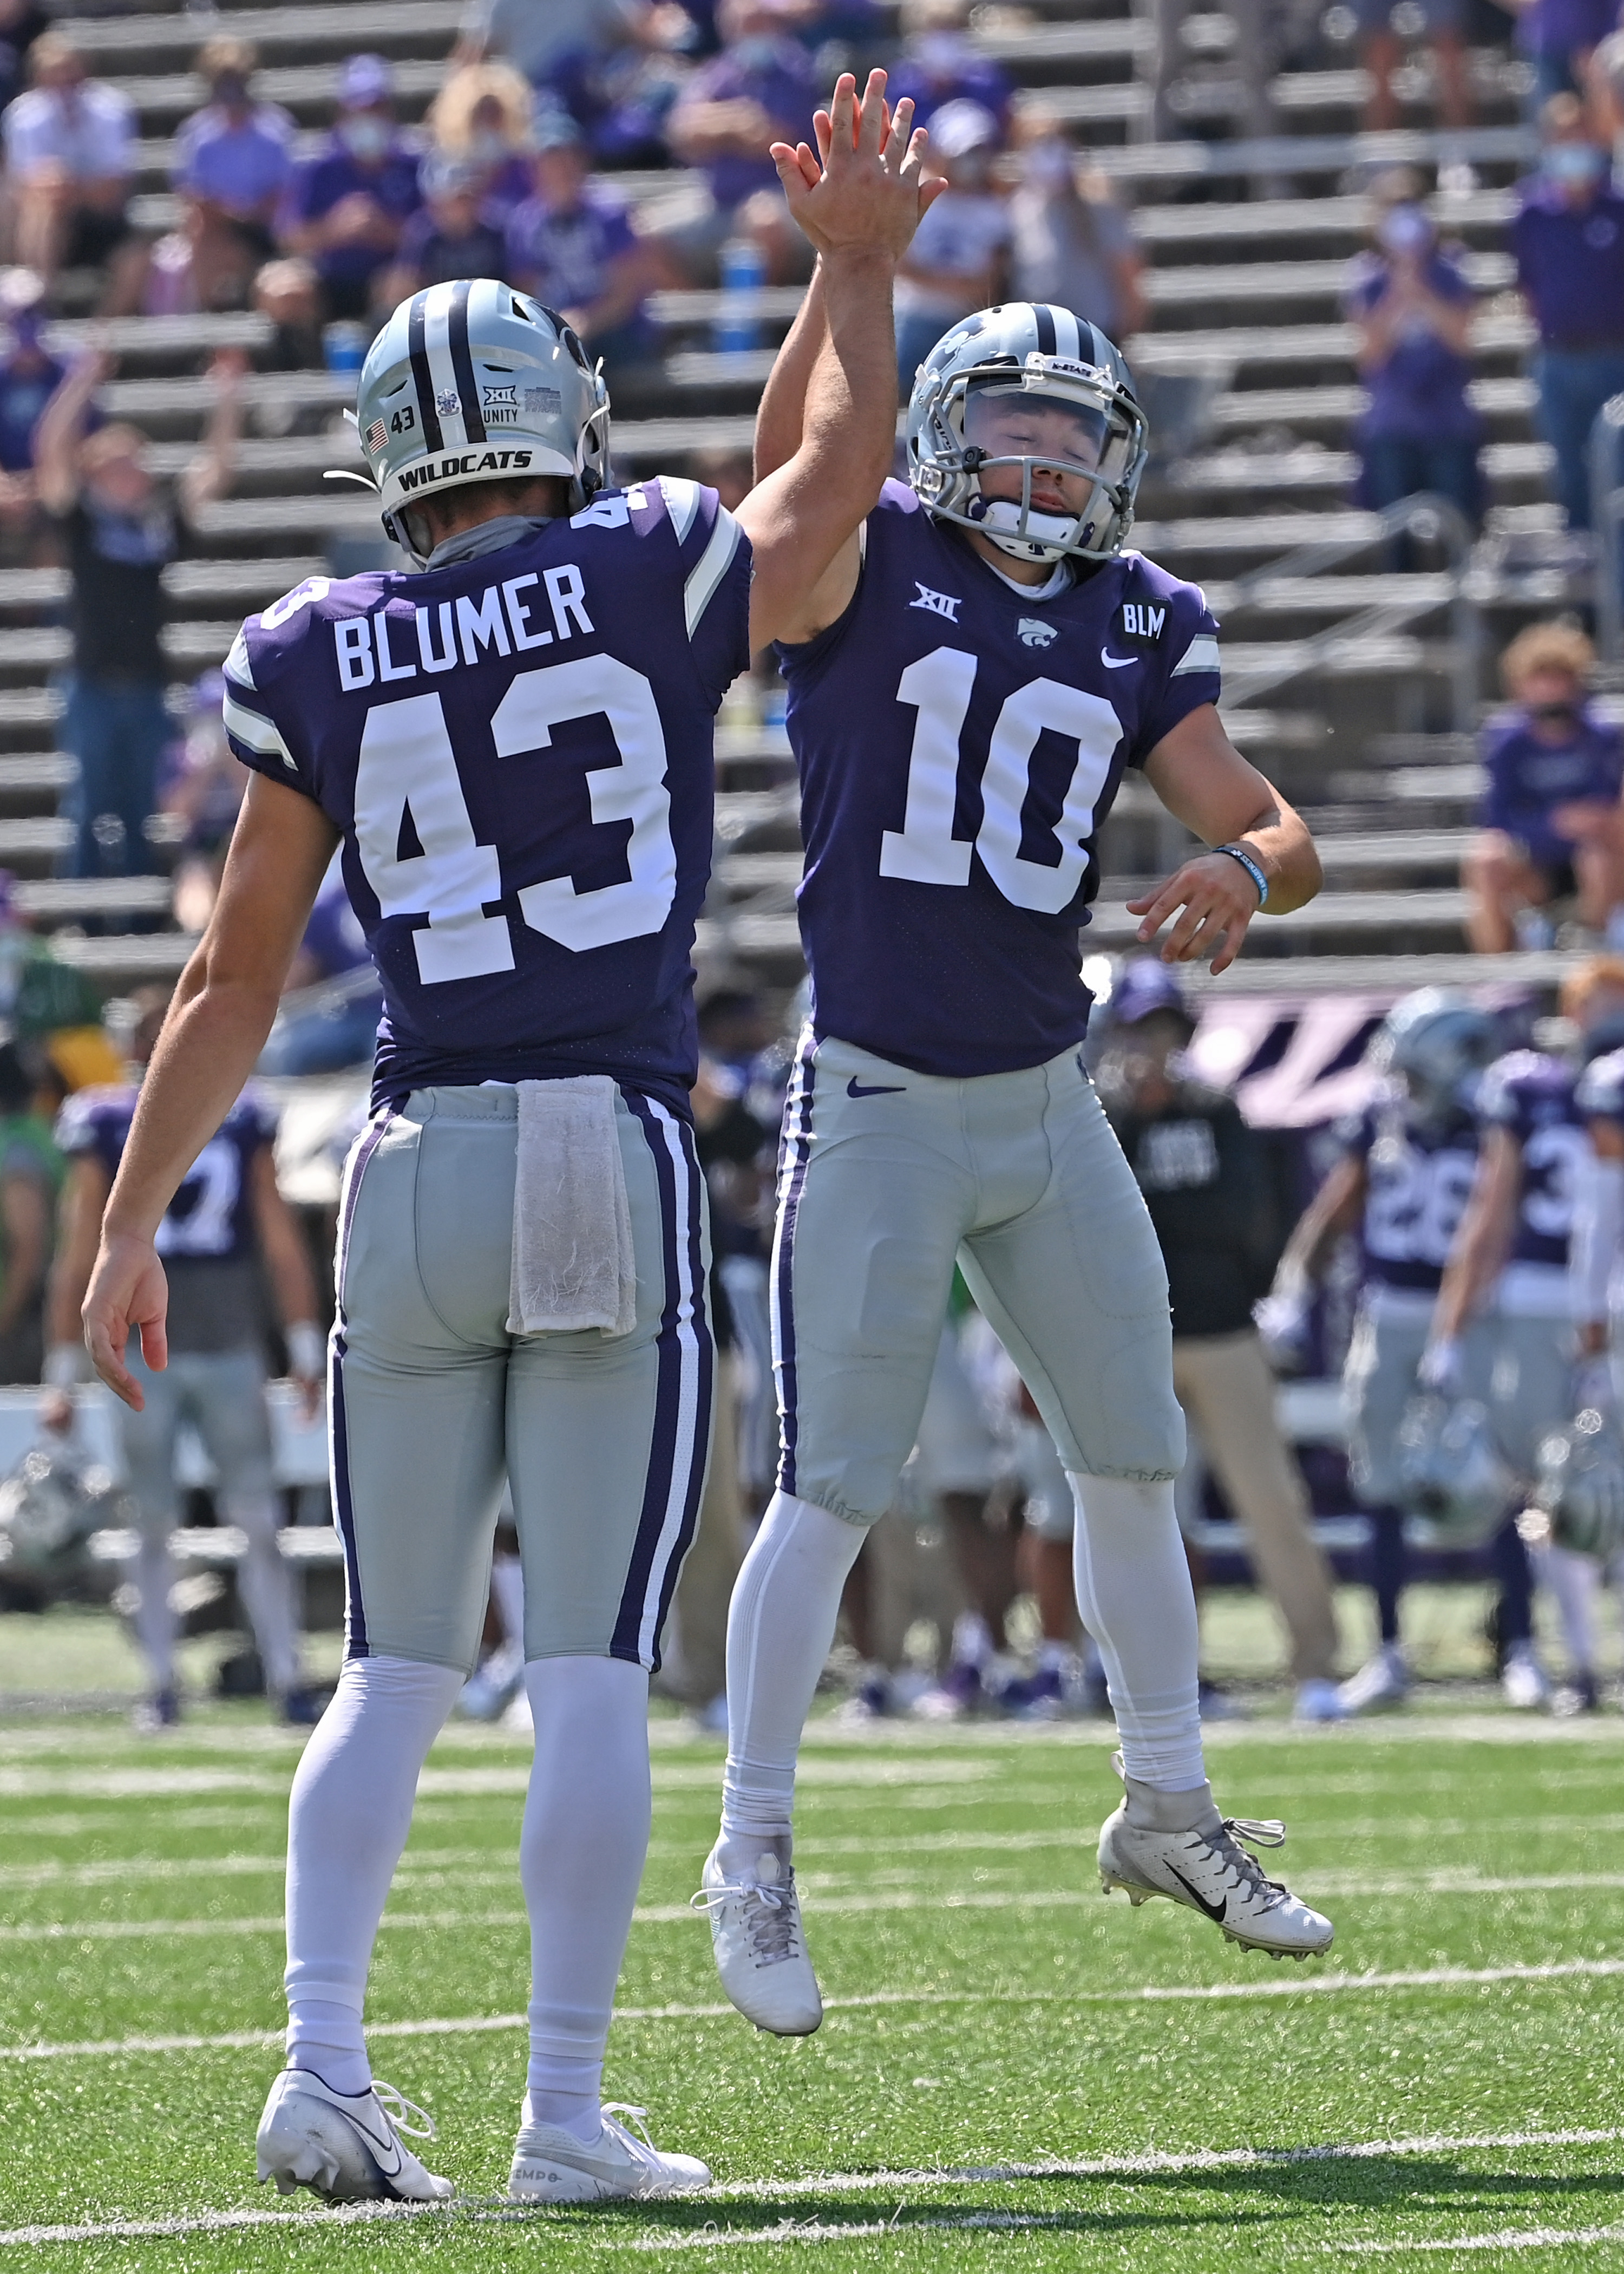 #43 Jack Blumer and #10 Blake Lynch